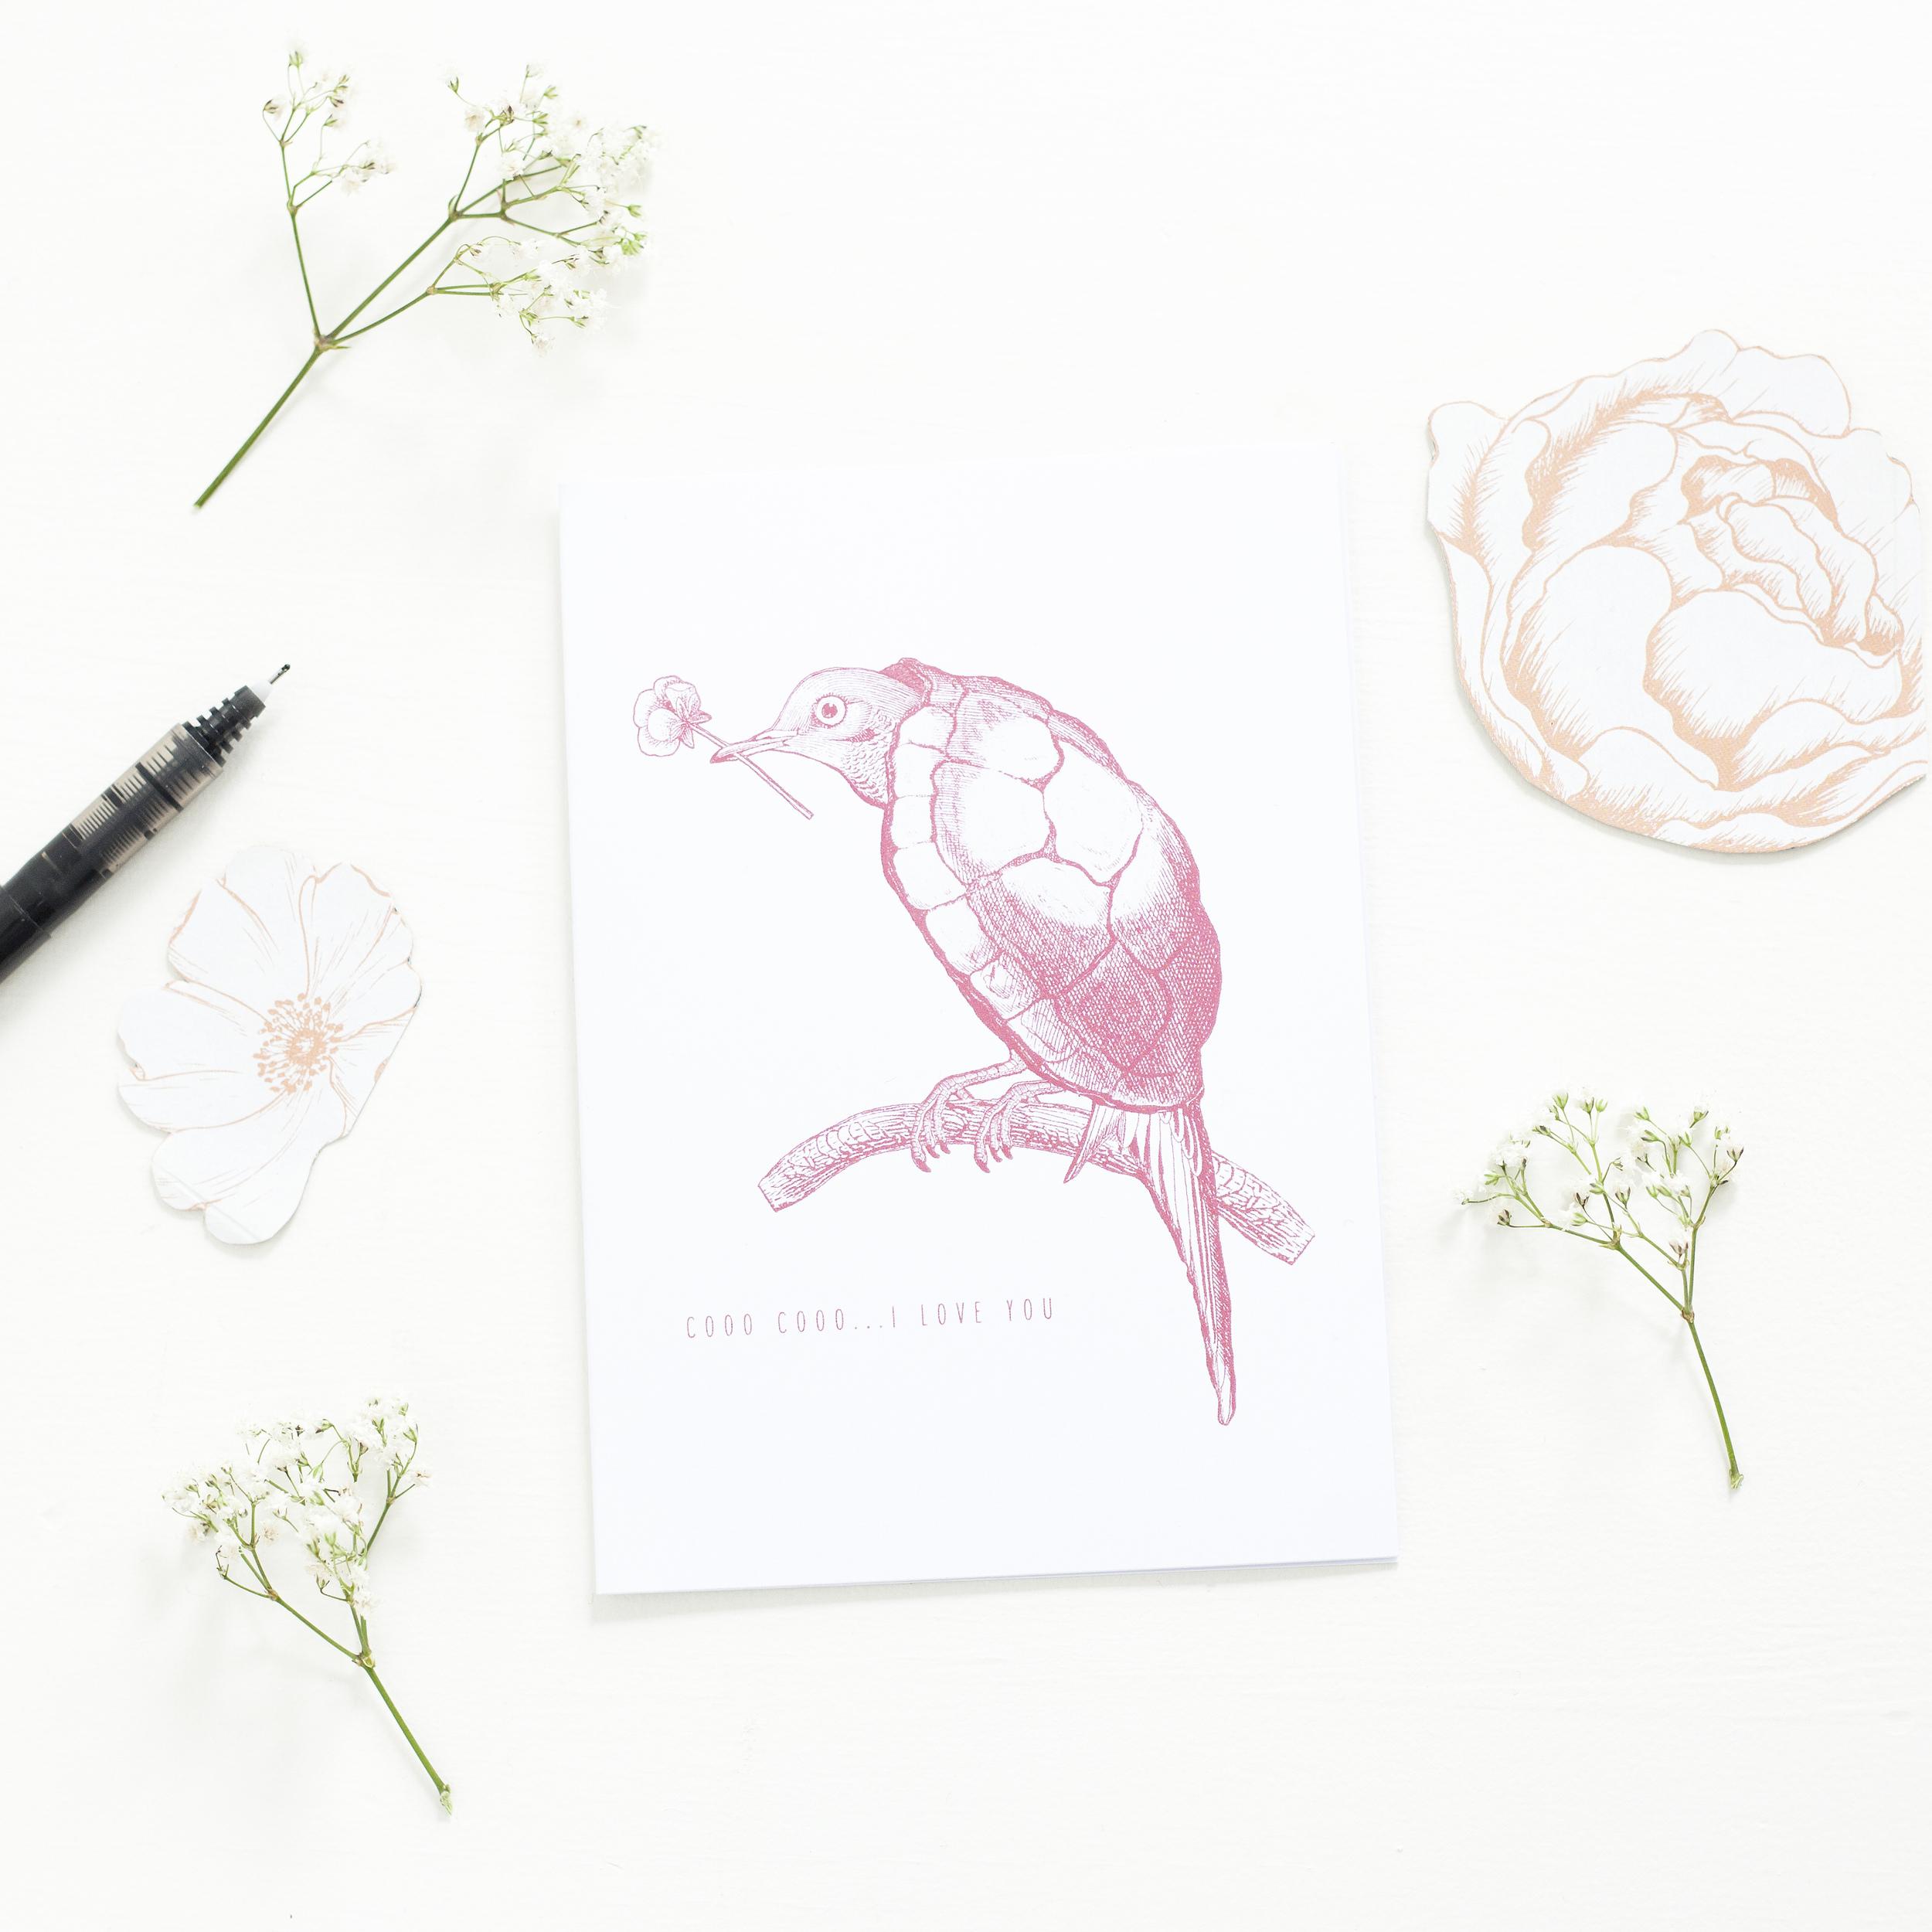 birdbraincard1